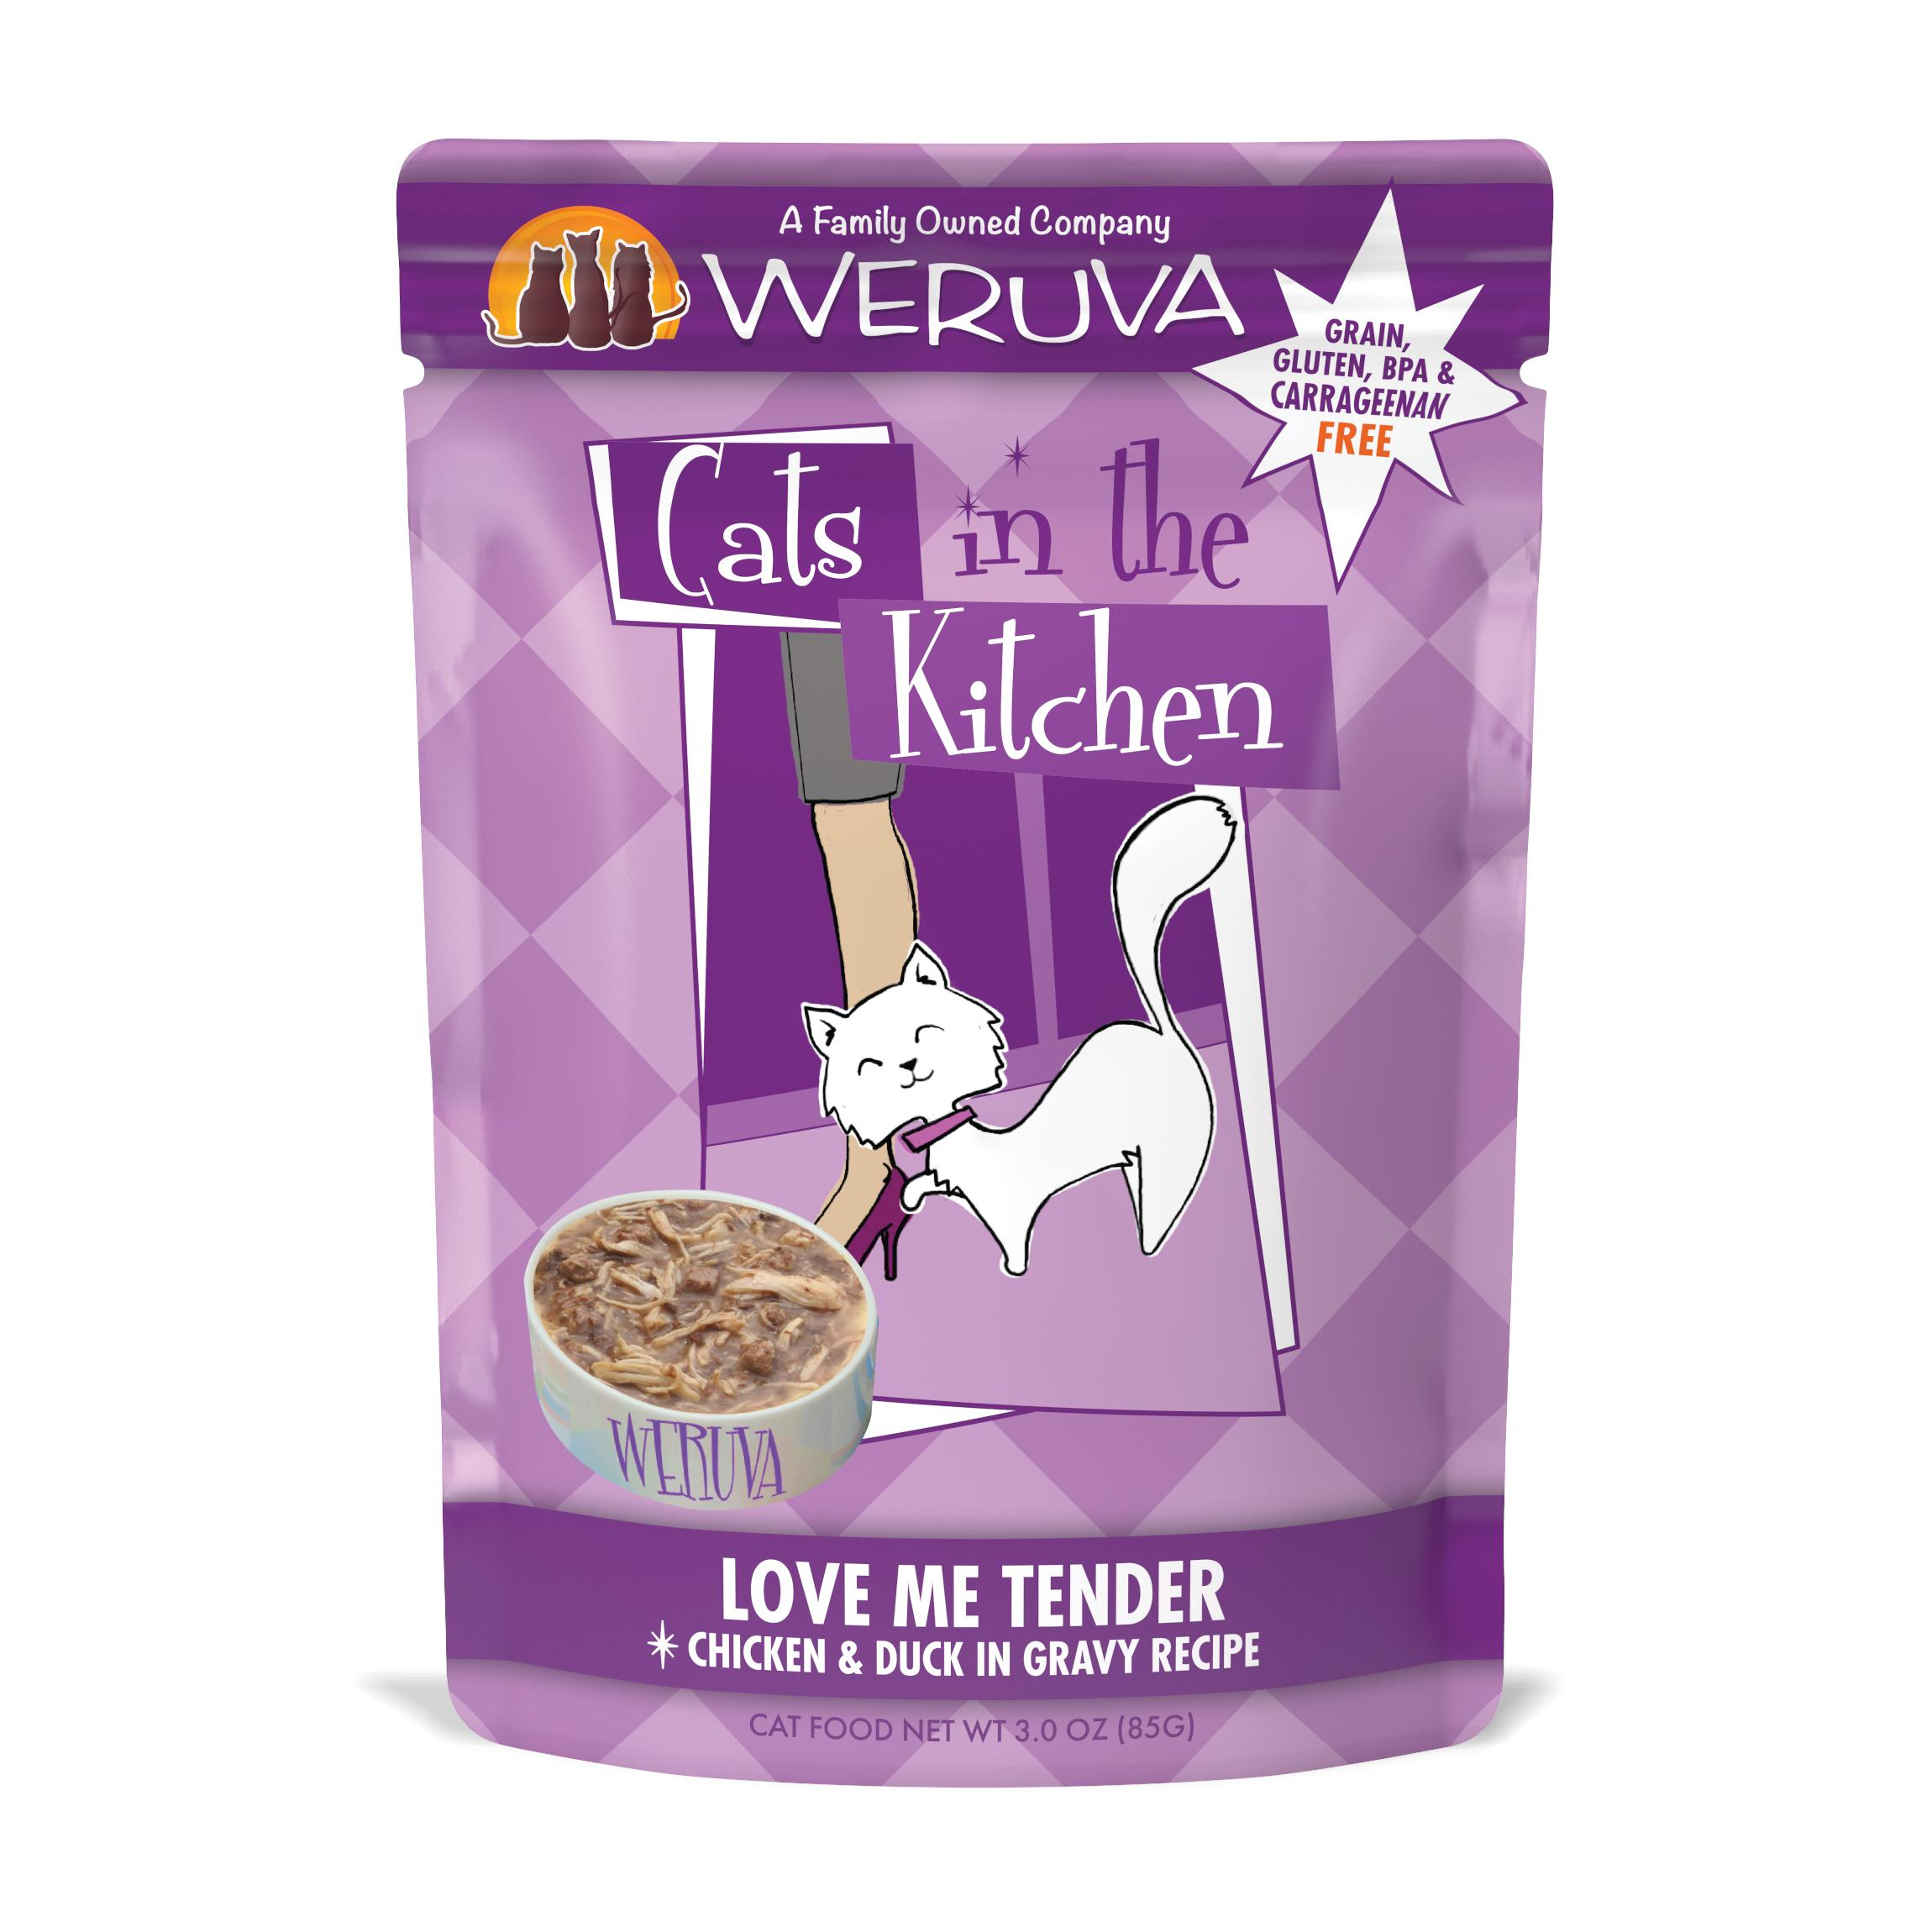 Weruva Cats in the Kitchen Love Me Tender Chicken & Duck in Gravy Recipe Grain-Free Wet Cat Food Image